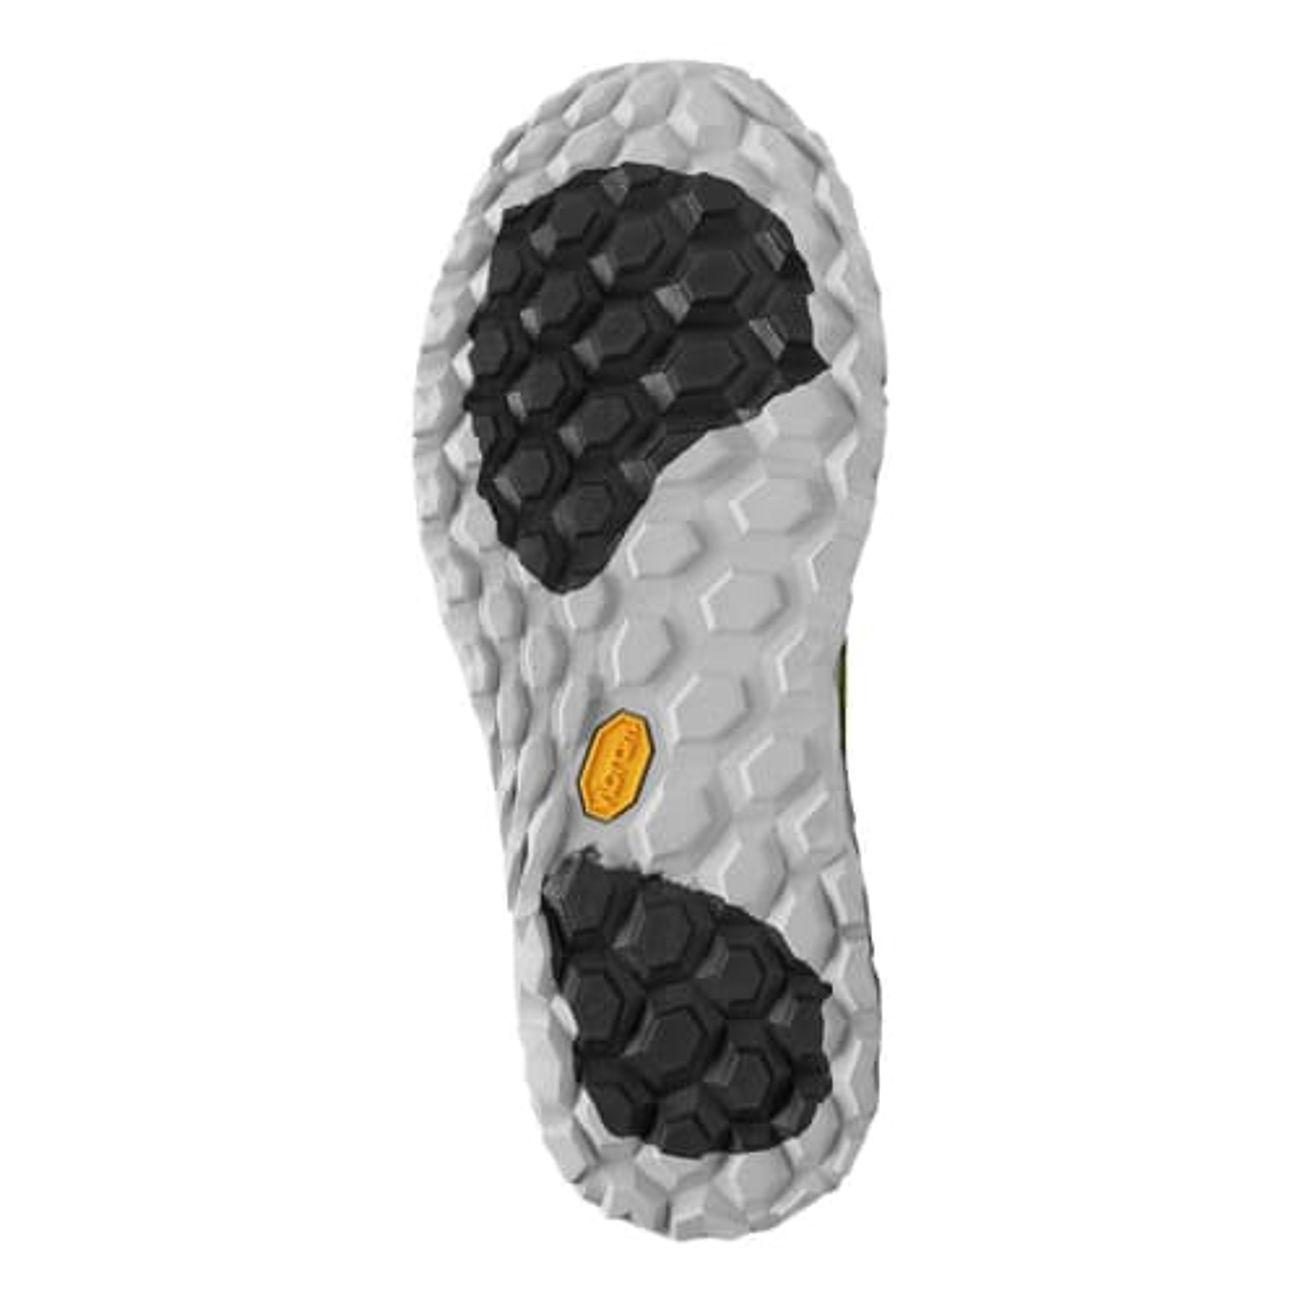 5ba653d0b45c Balance Foam Fluo V3 Hierro Chaussures Fresh Jaune New Noir qpwF5t